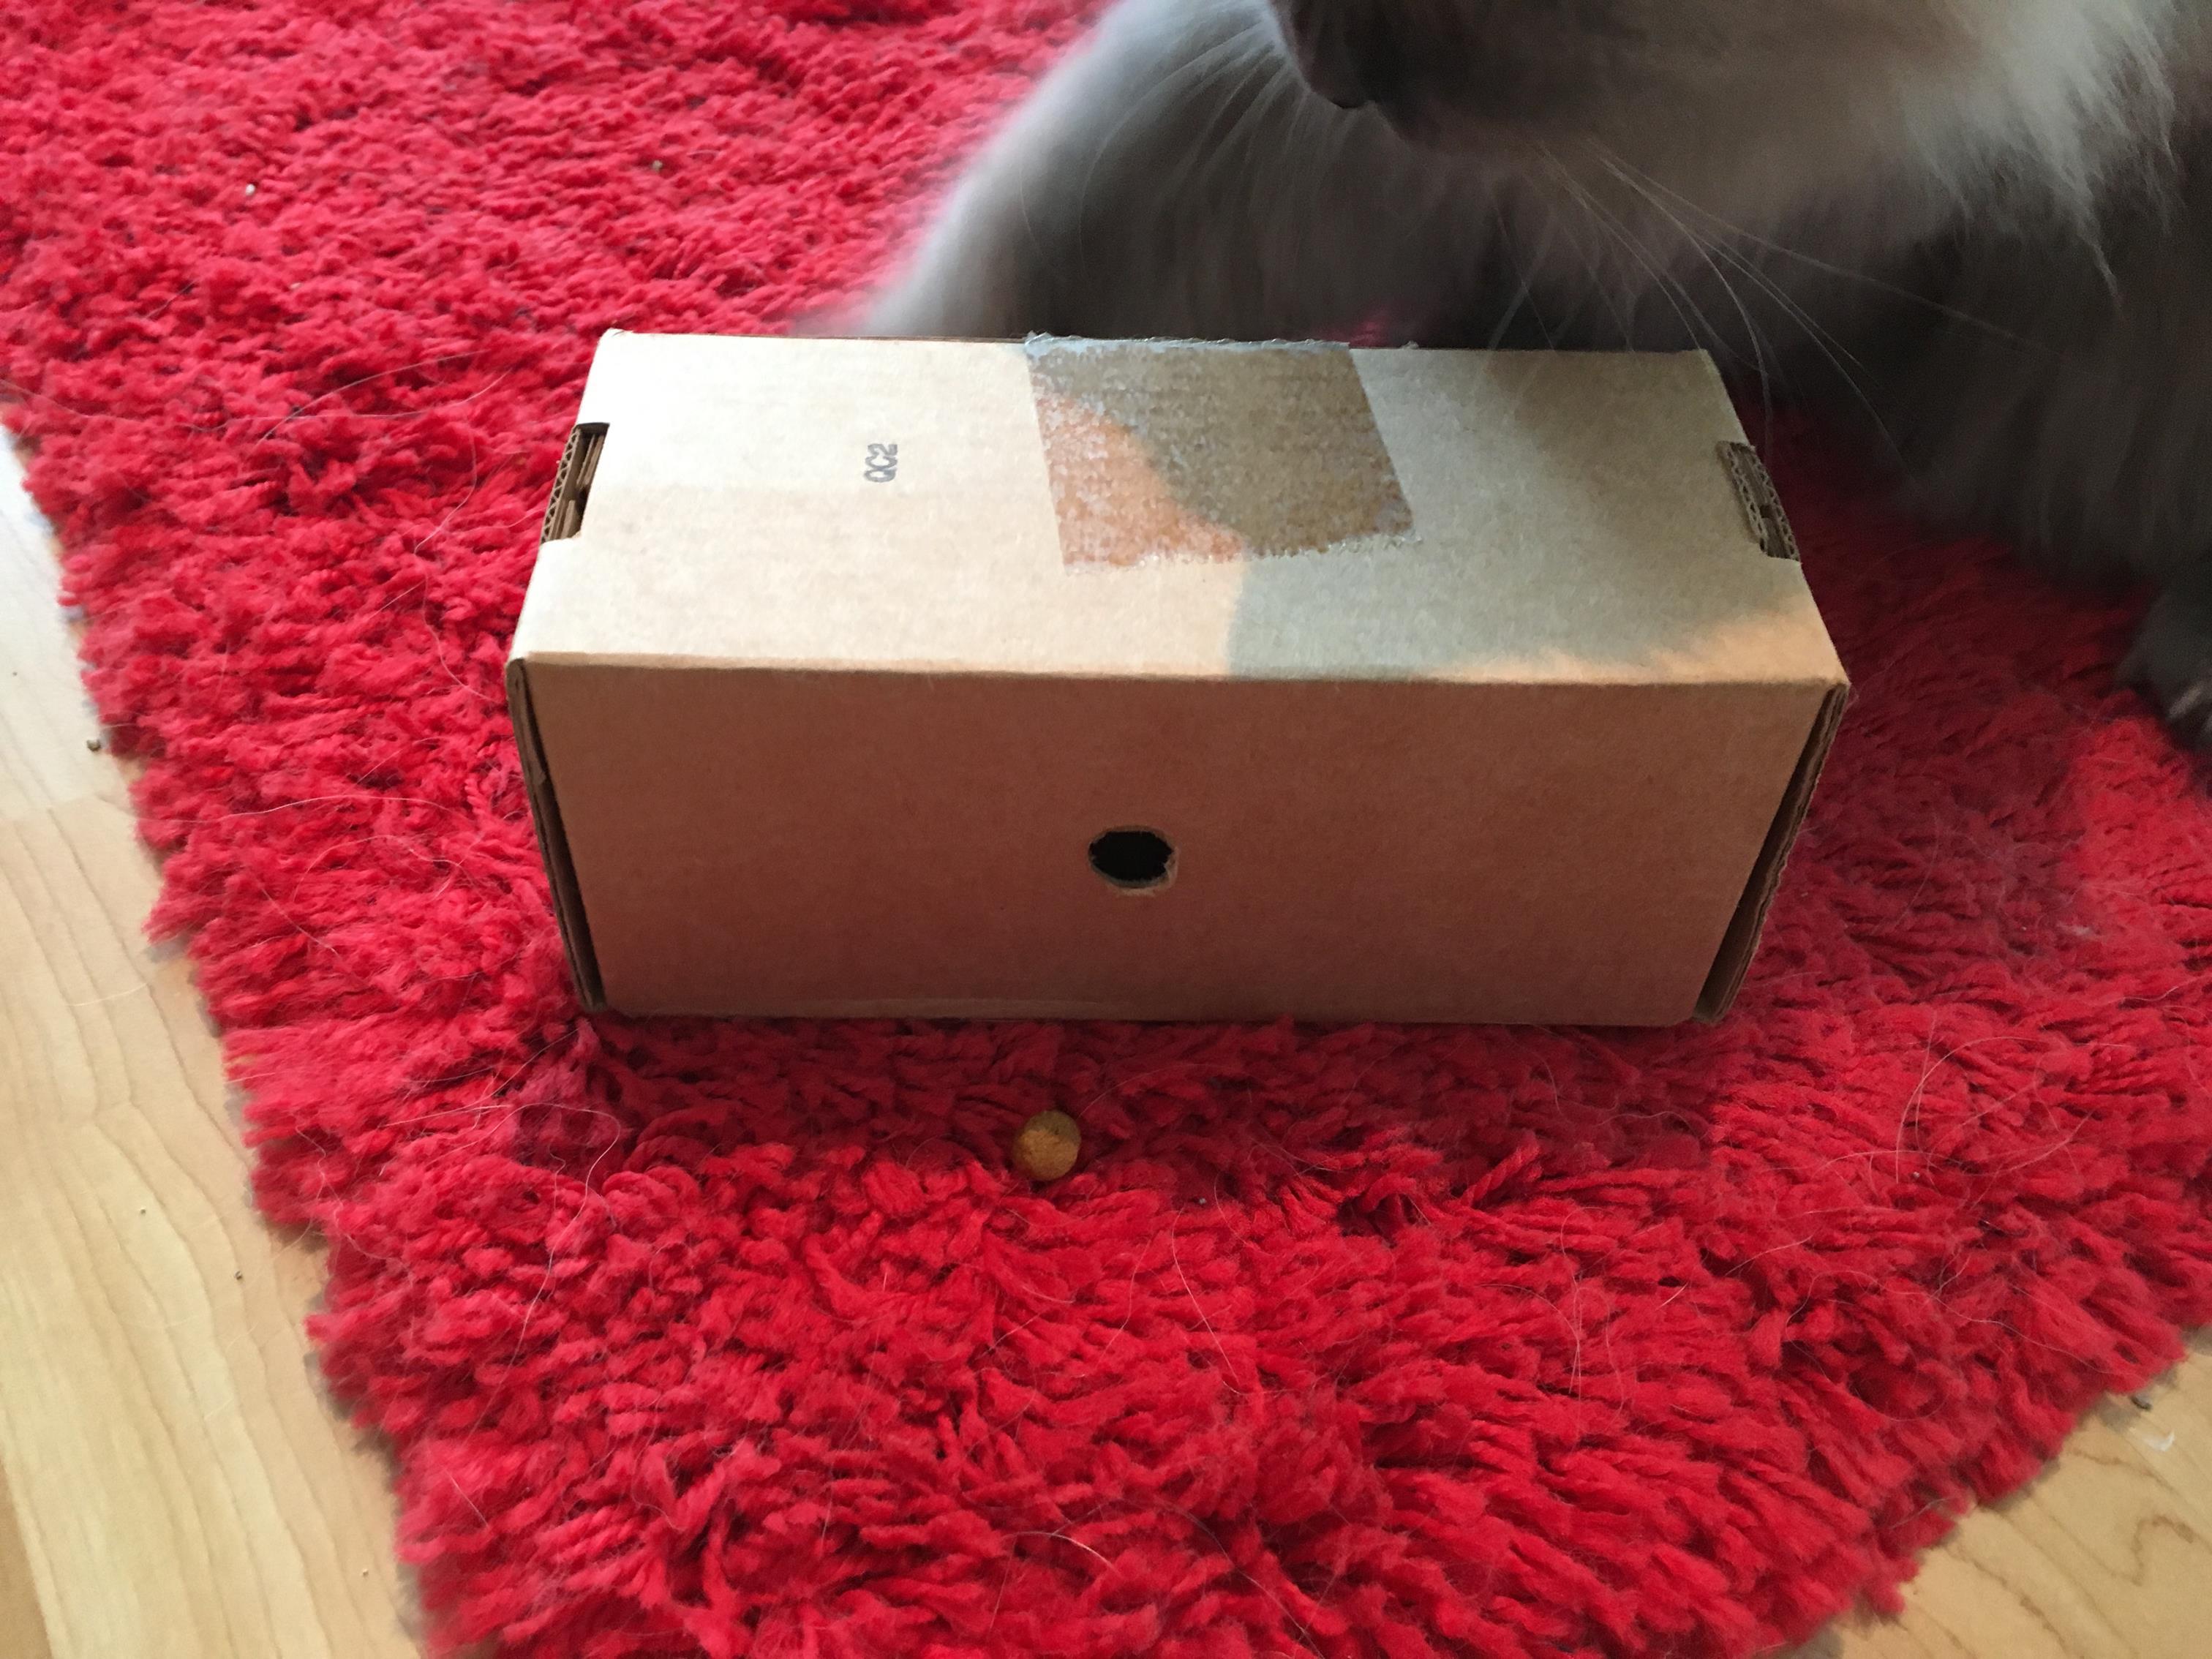 1. Poke hole in a cardboard box.